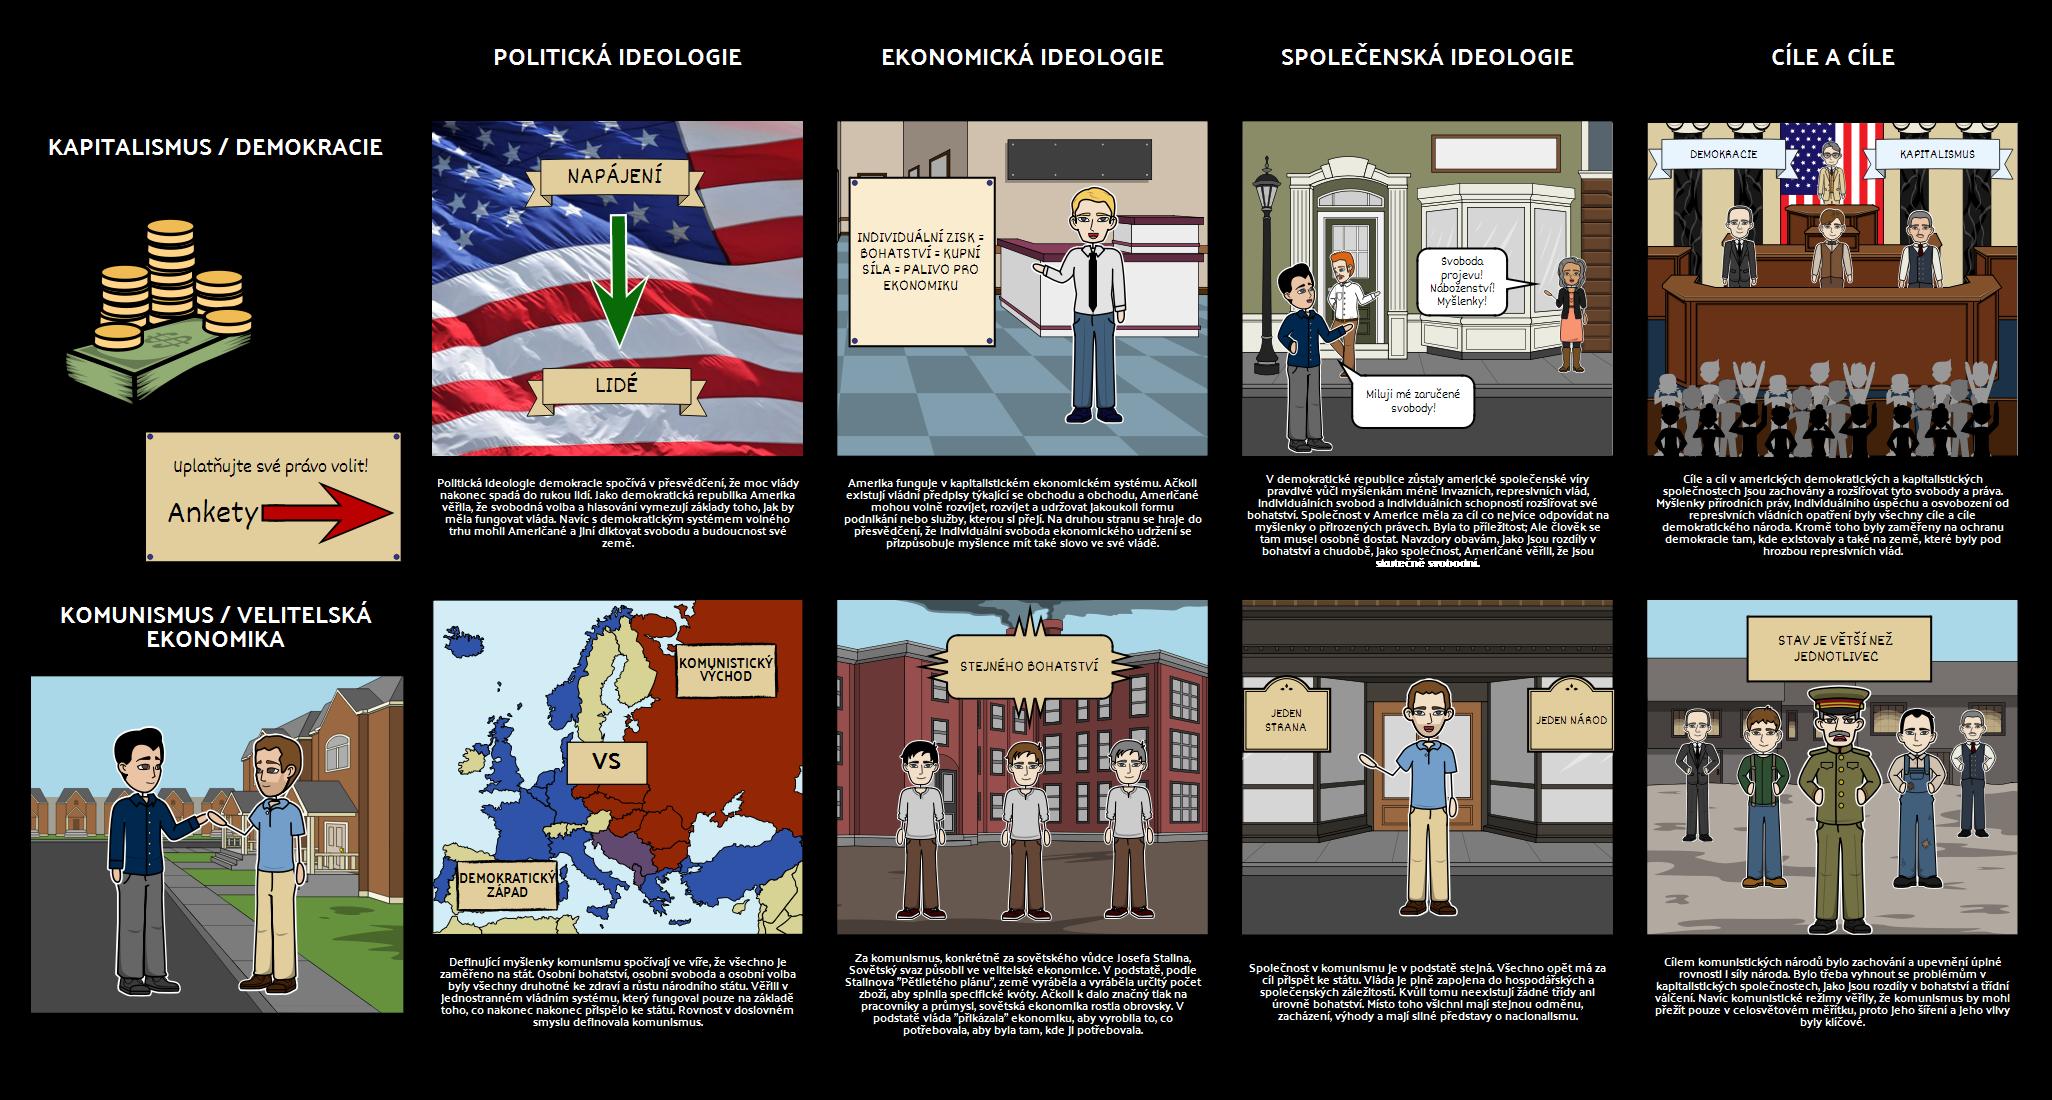 Srovnávací Grid - Cold War - Komunismus vs. Kapitalismus / Demokracie